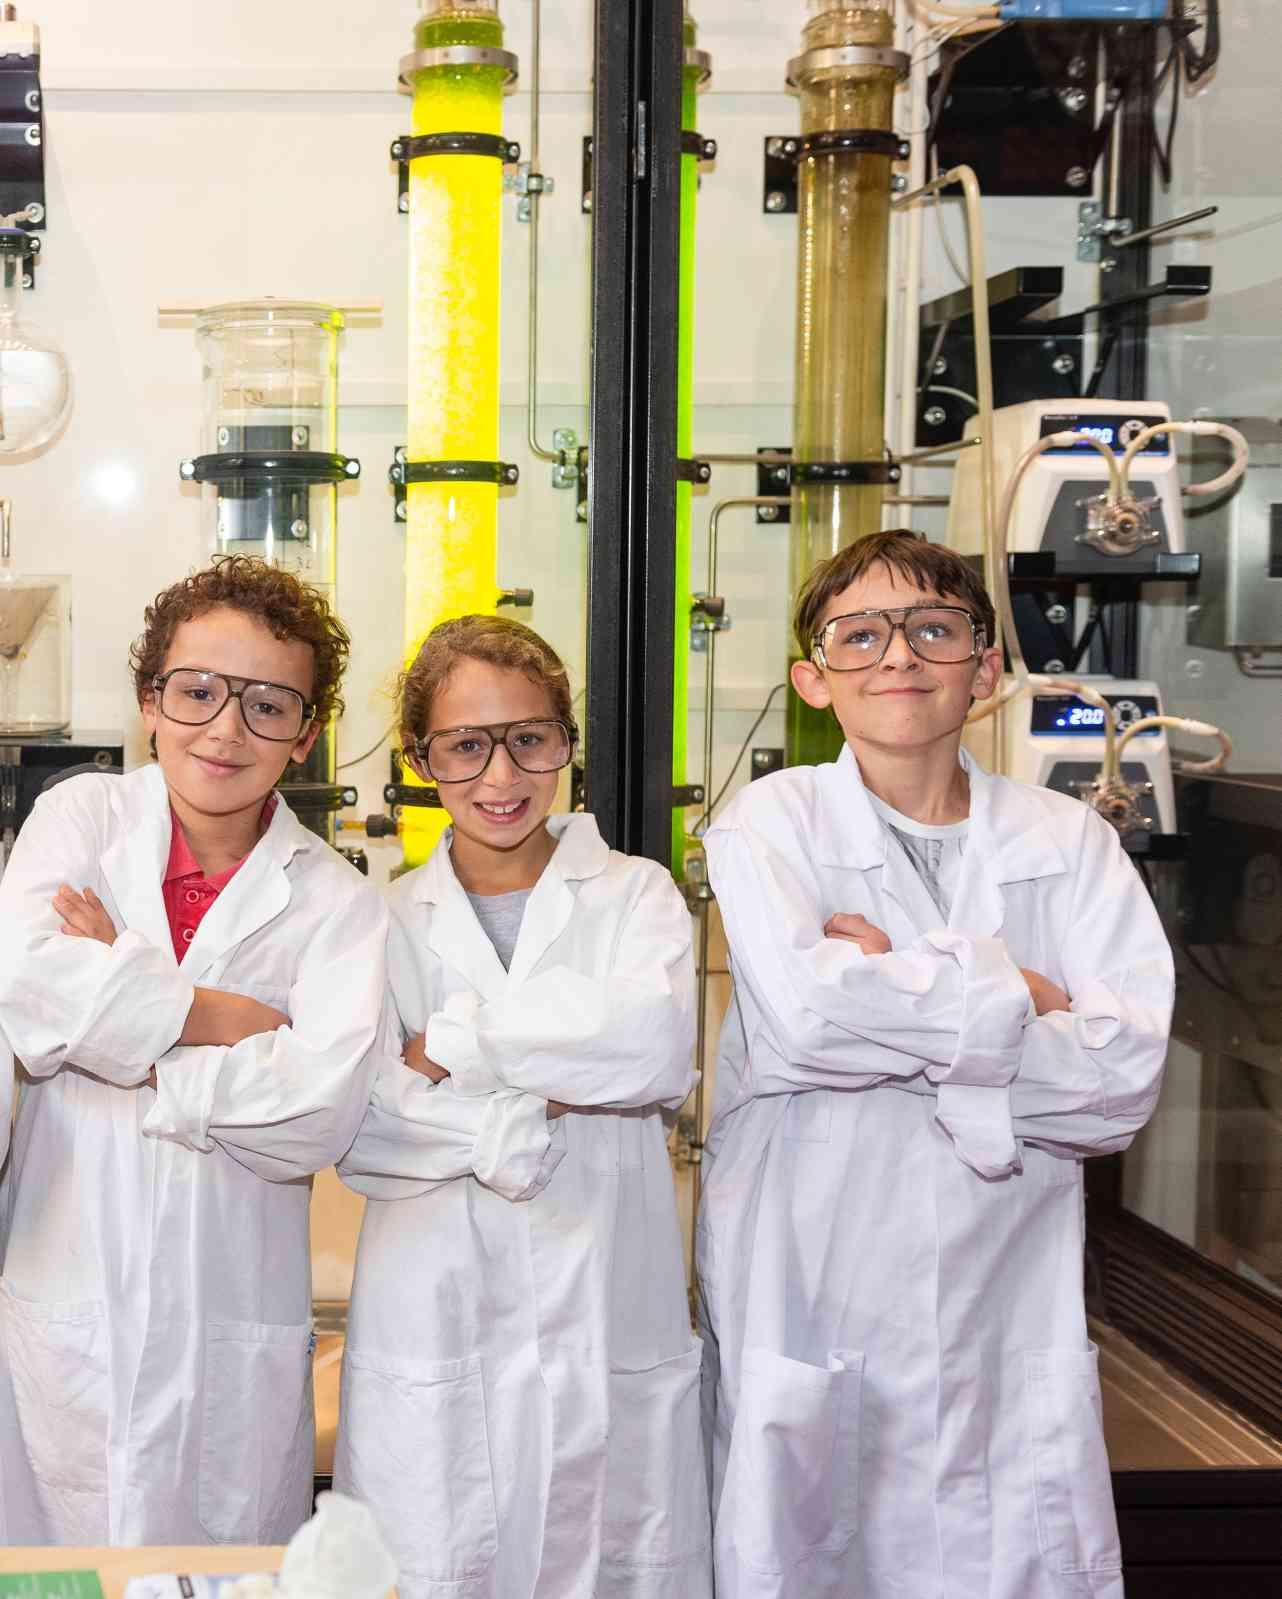 Bezoek Science Centre Delft